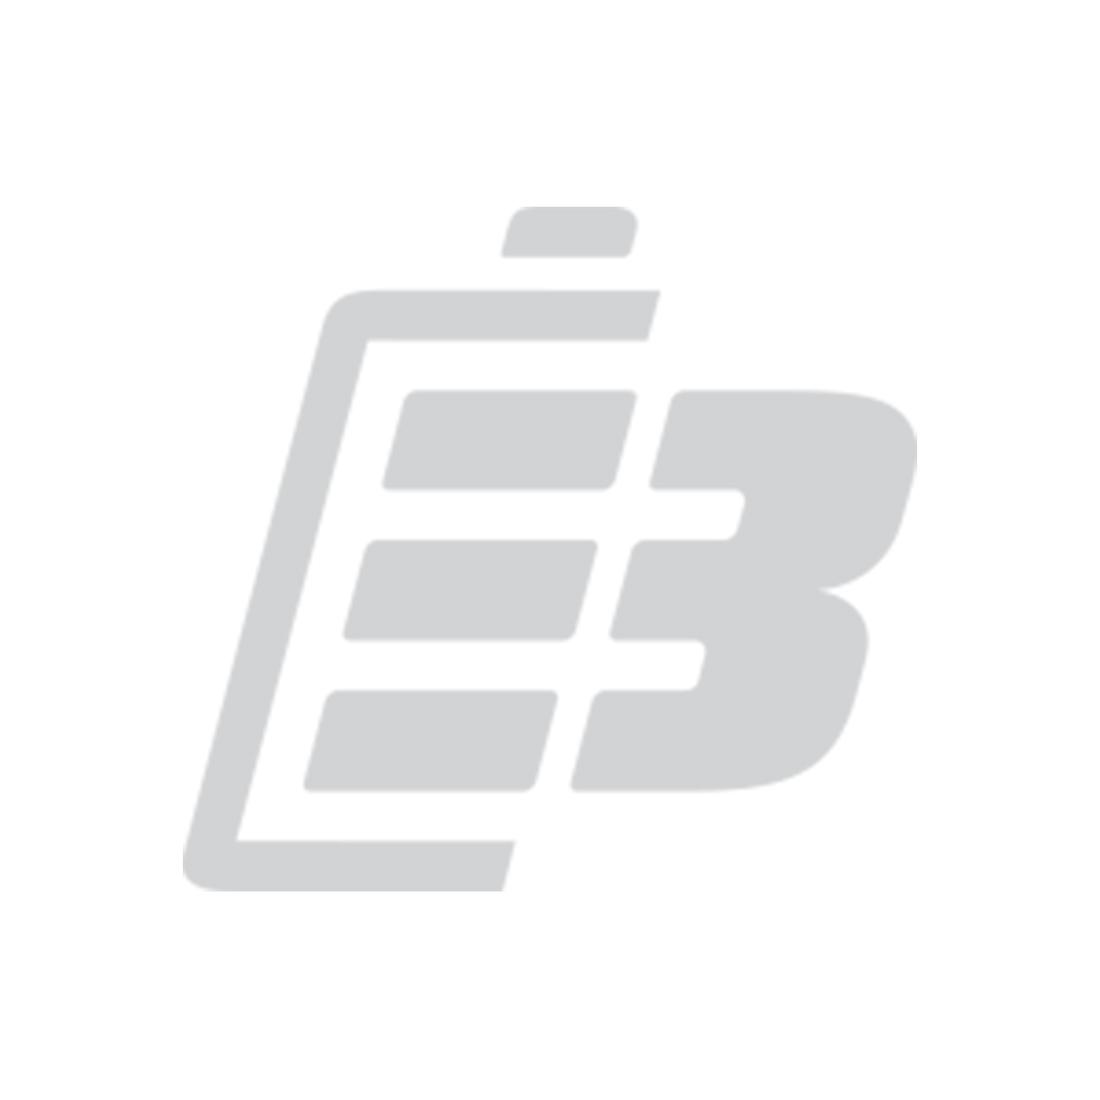 Smartphone battery Acer Liquid_1